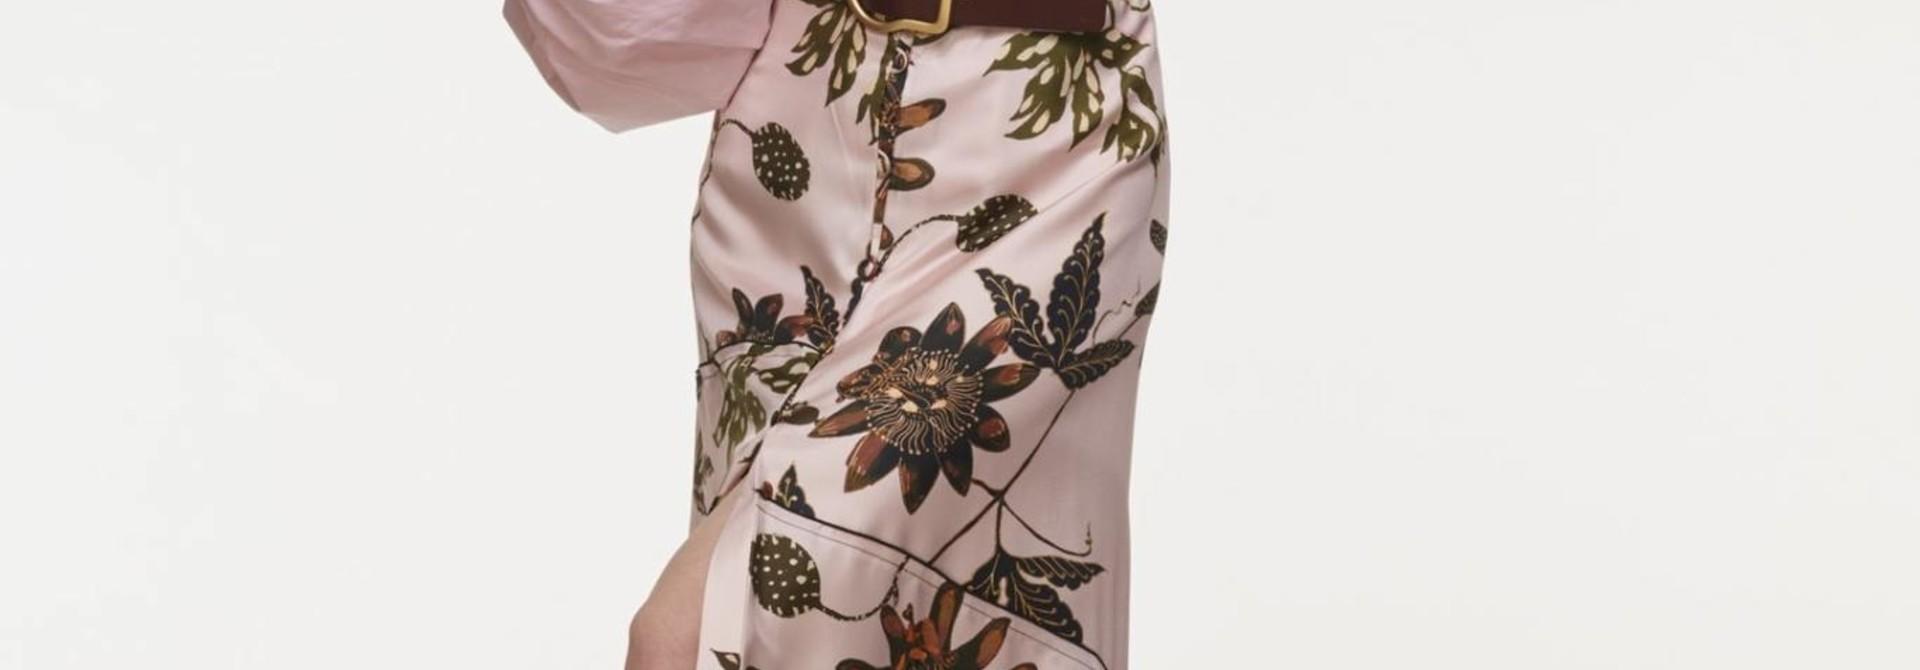 Powerful flora skirt dorothee schumacher